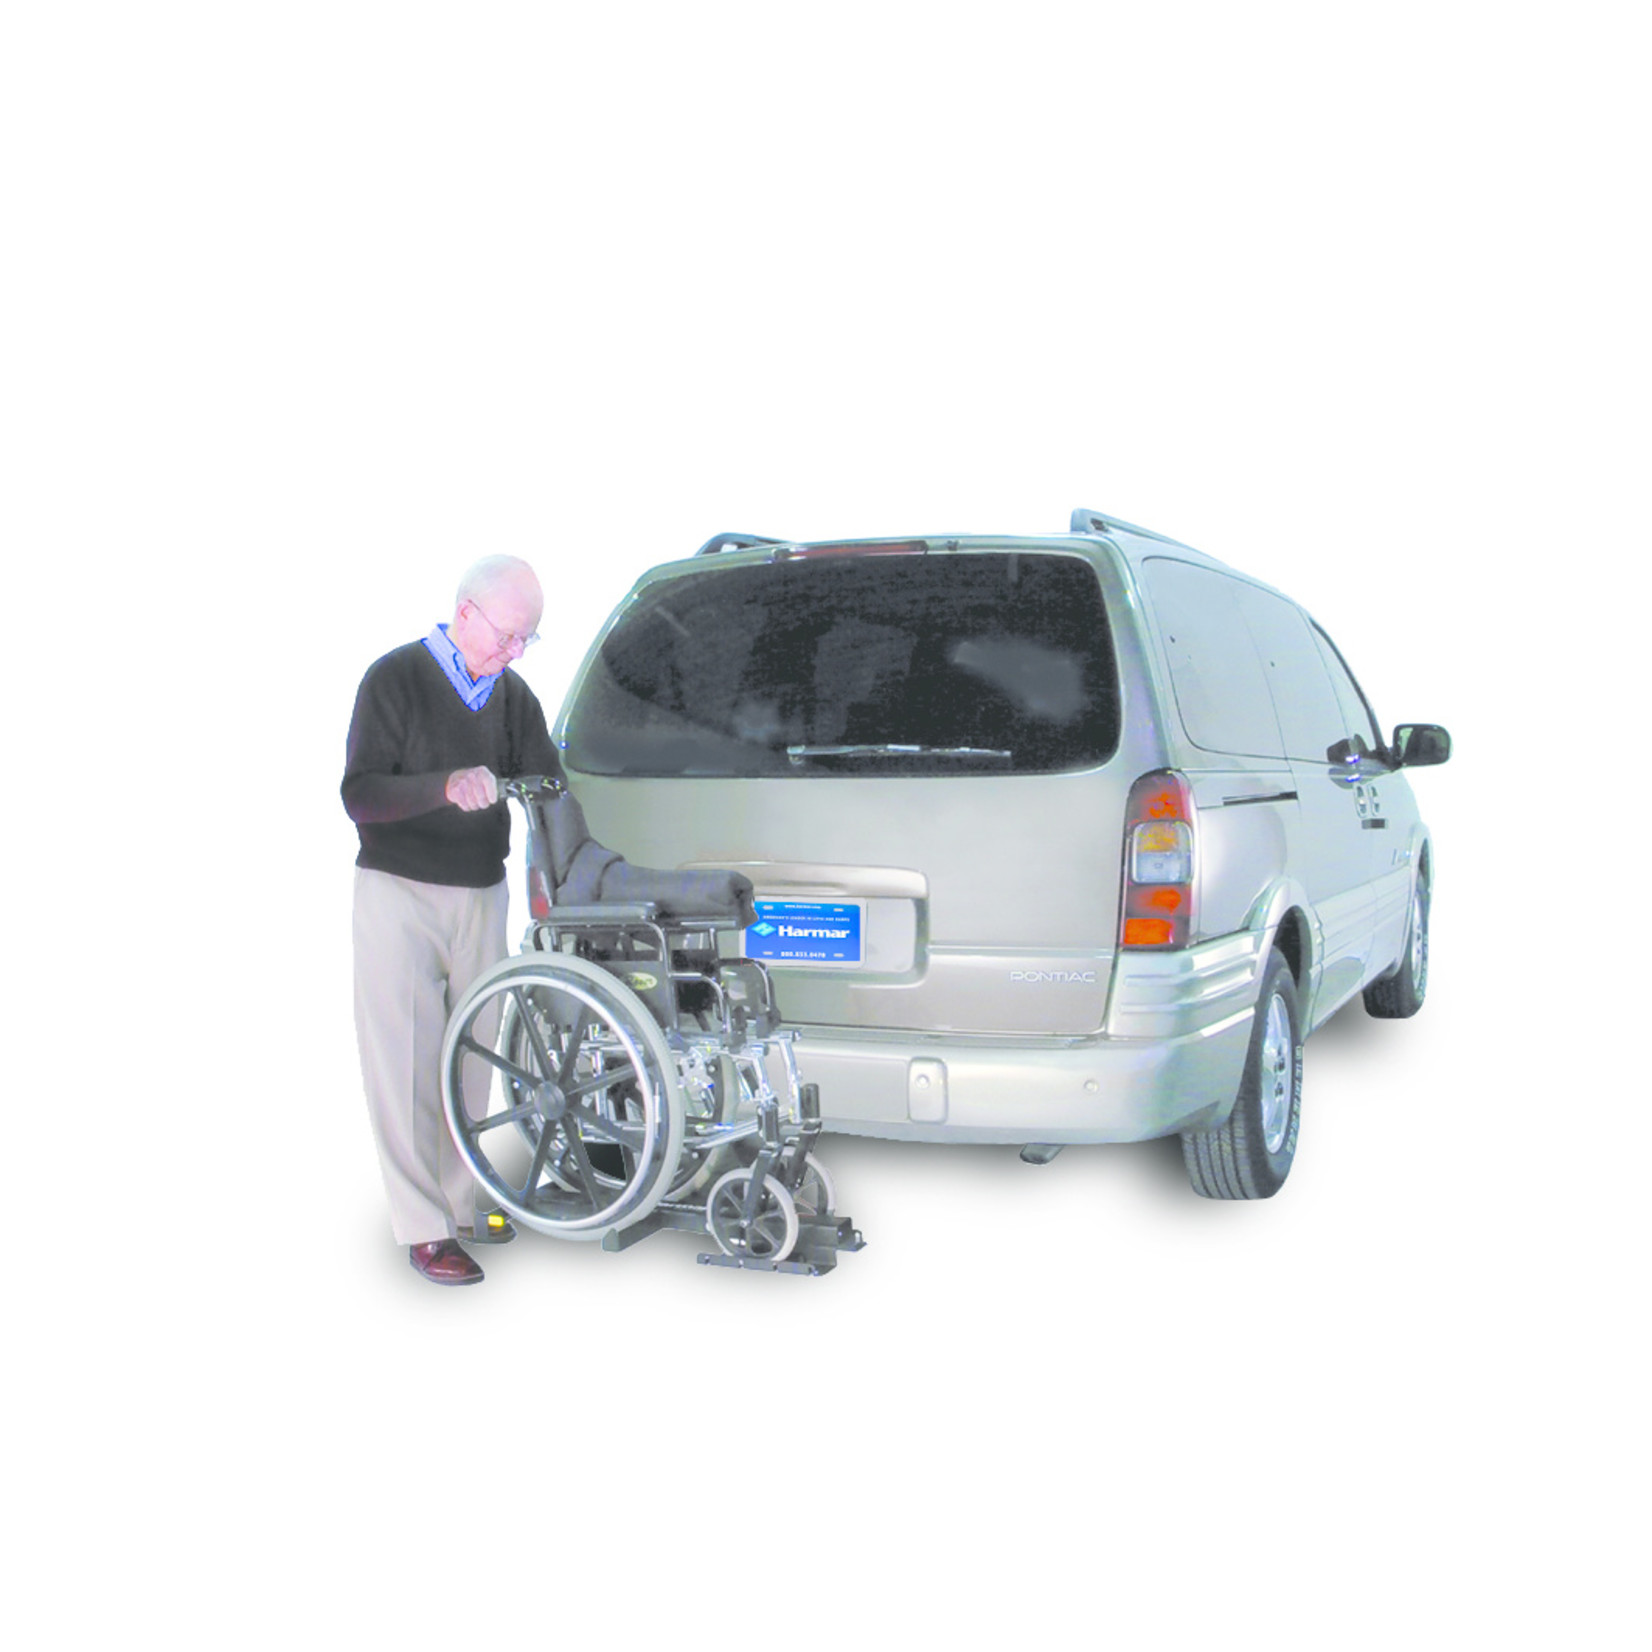 Harmar Mobility AL003 Tilt-n-Tote Lift